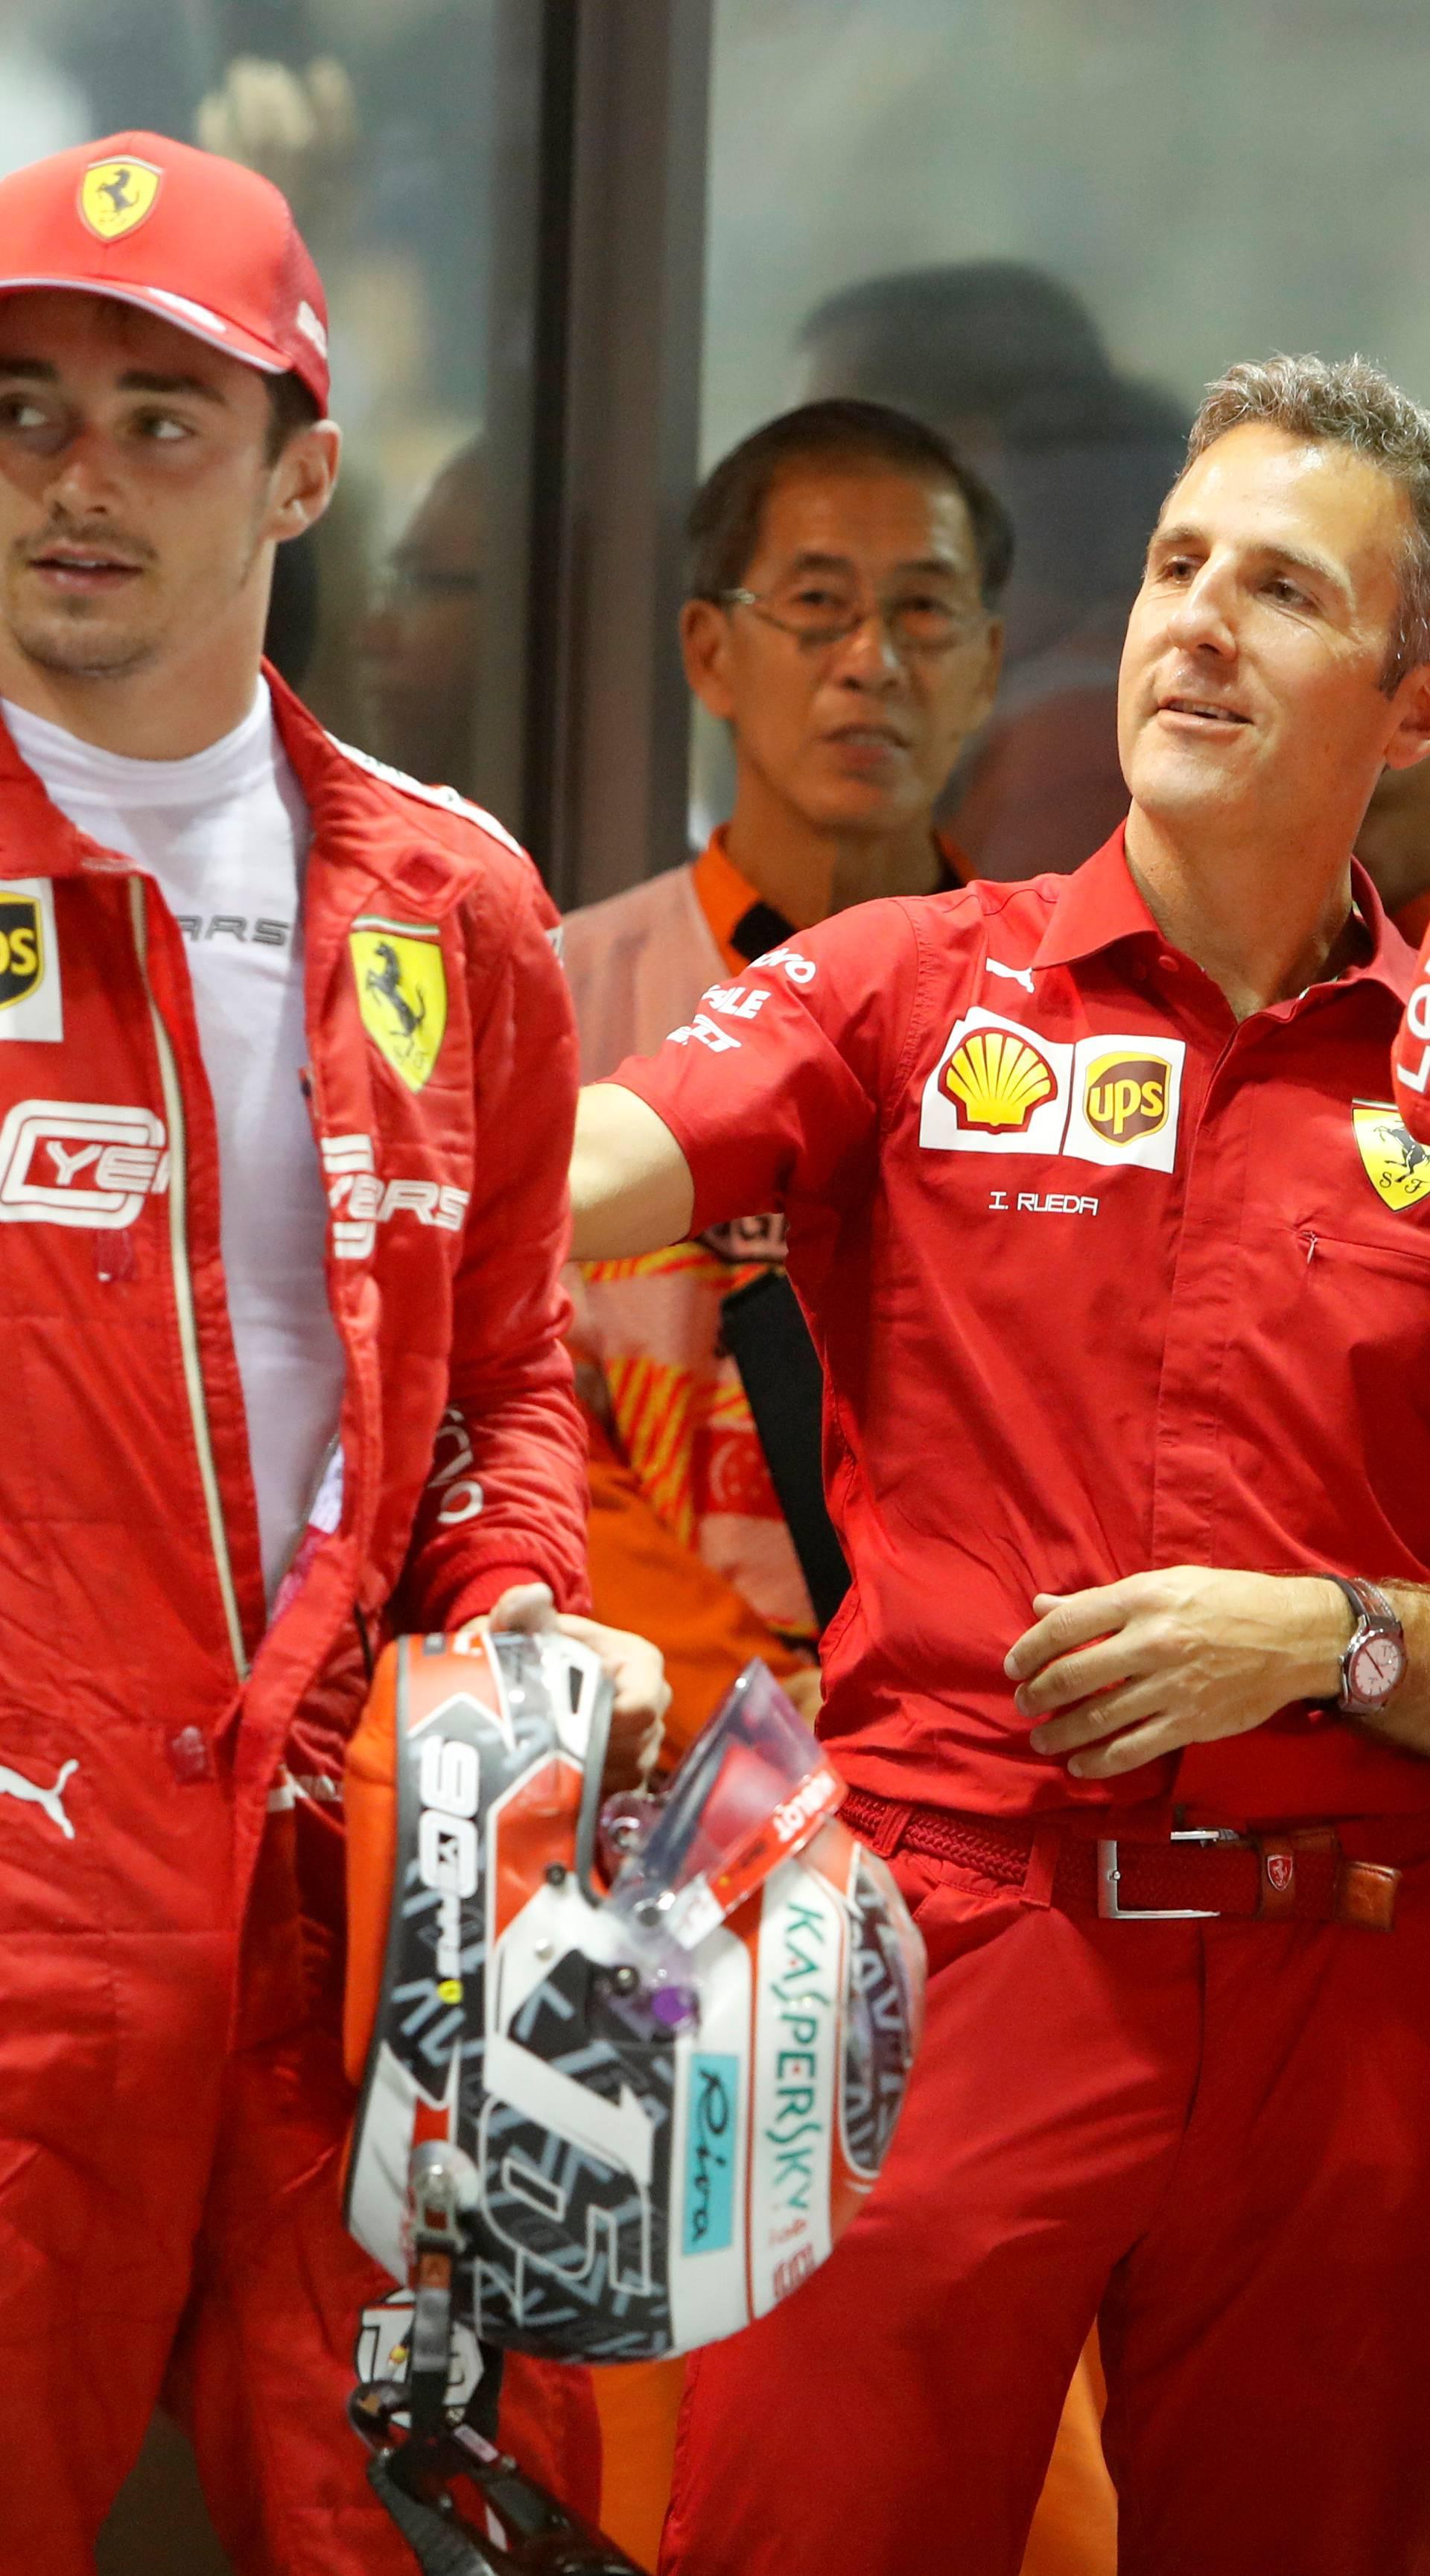 Rapsodija Ferrarija: Vettel prvi u trećoj pobjedi Talijana u nizu